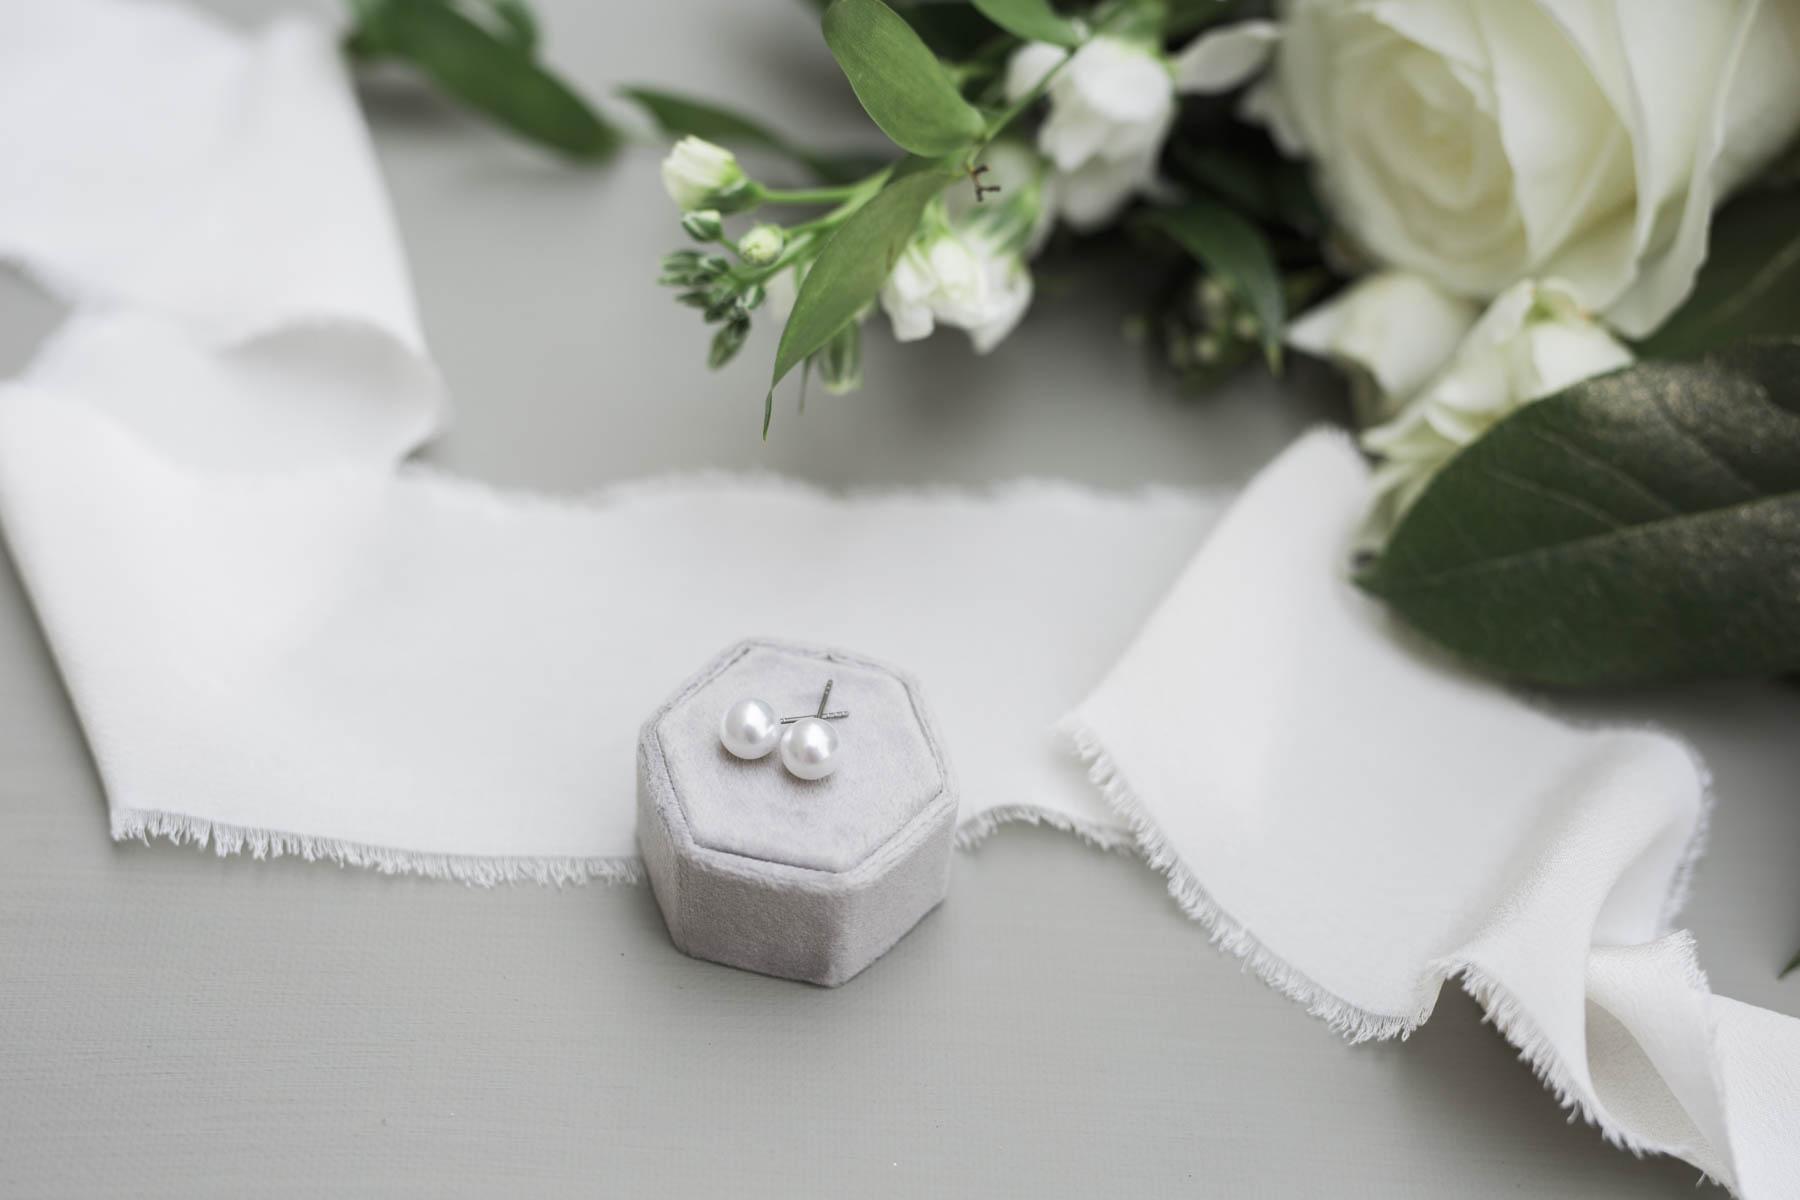 shotbychelsea_wedding_blog-3.jpg